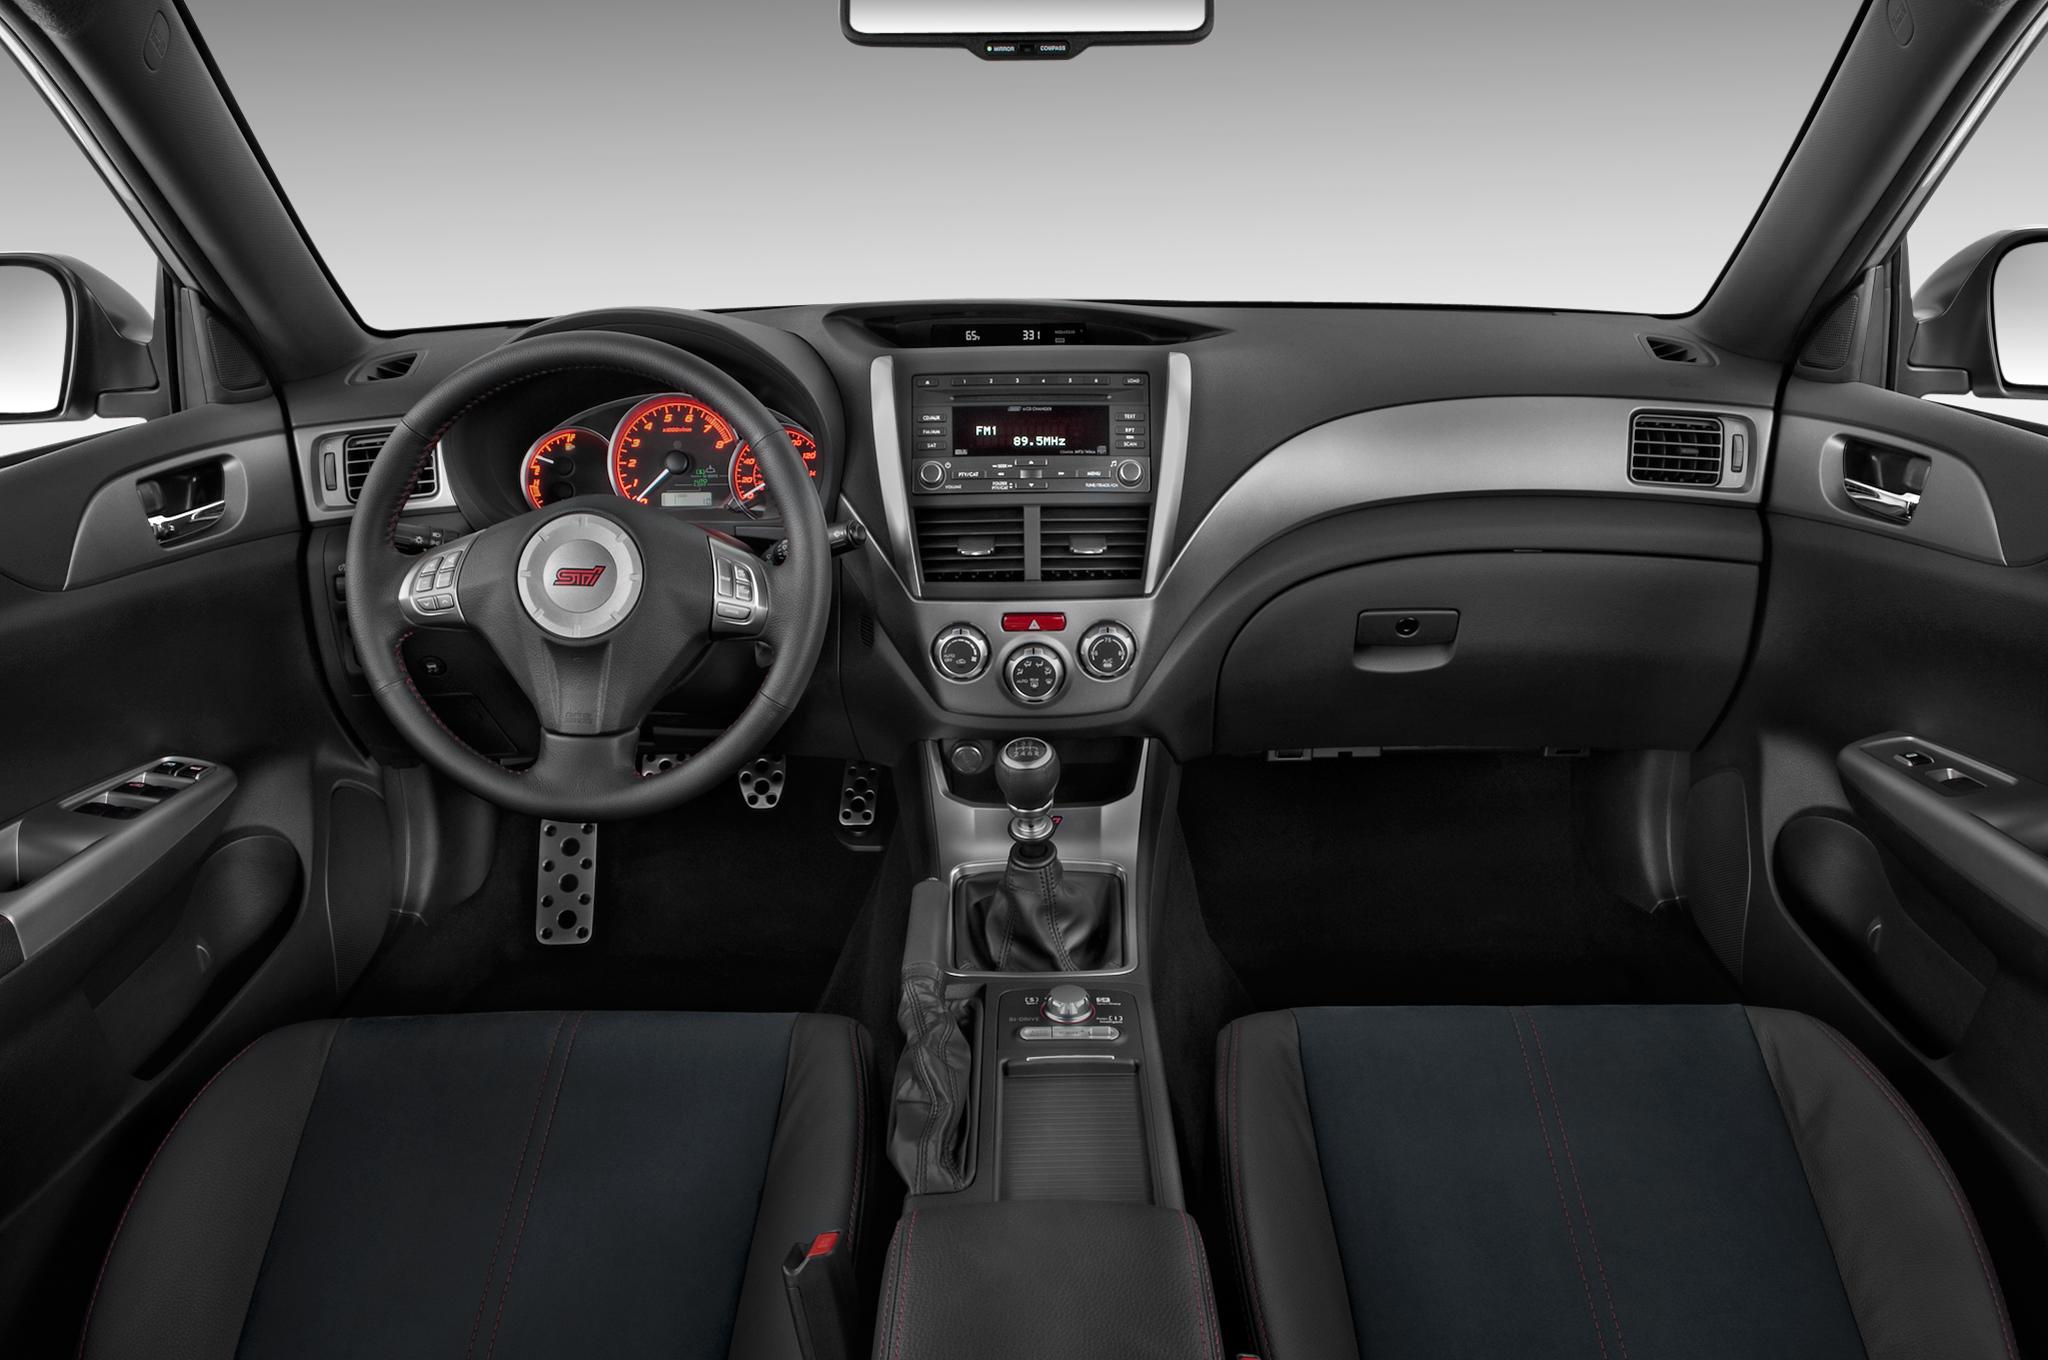 2010 Subaru Impreza Wrx Sti Special Edition 2009 La Auto